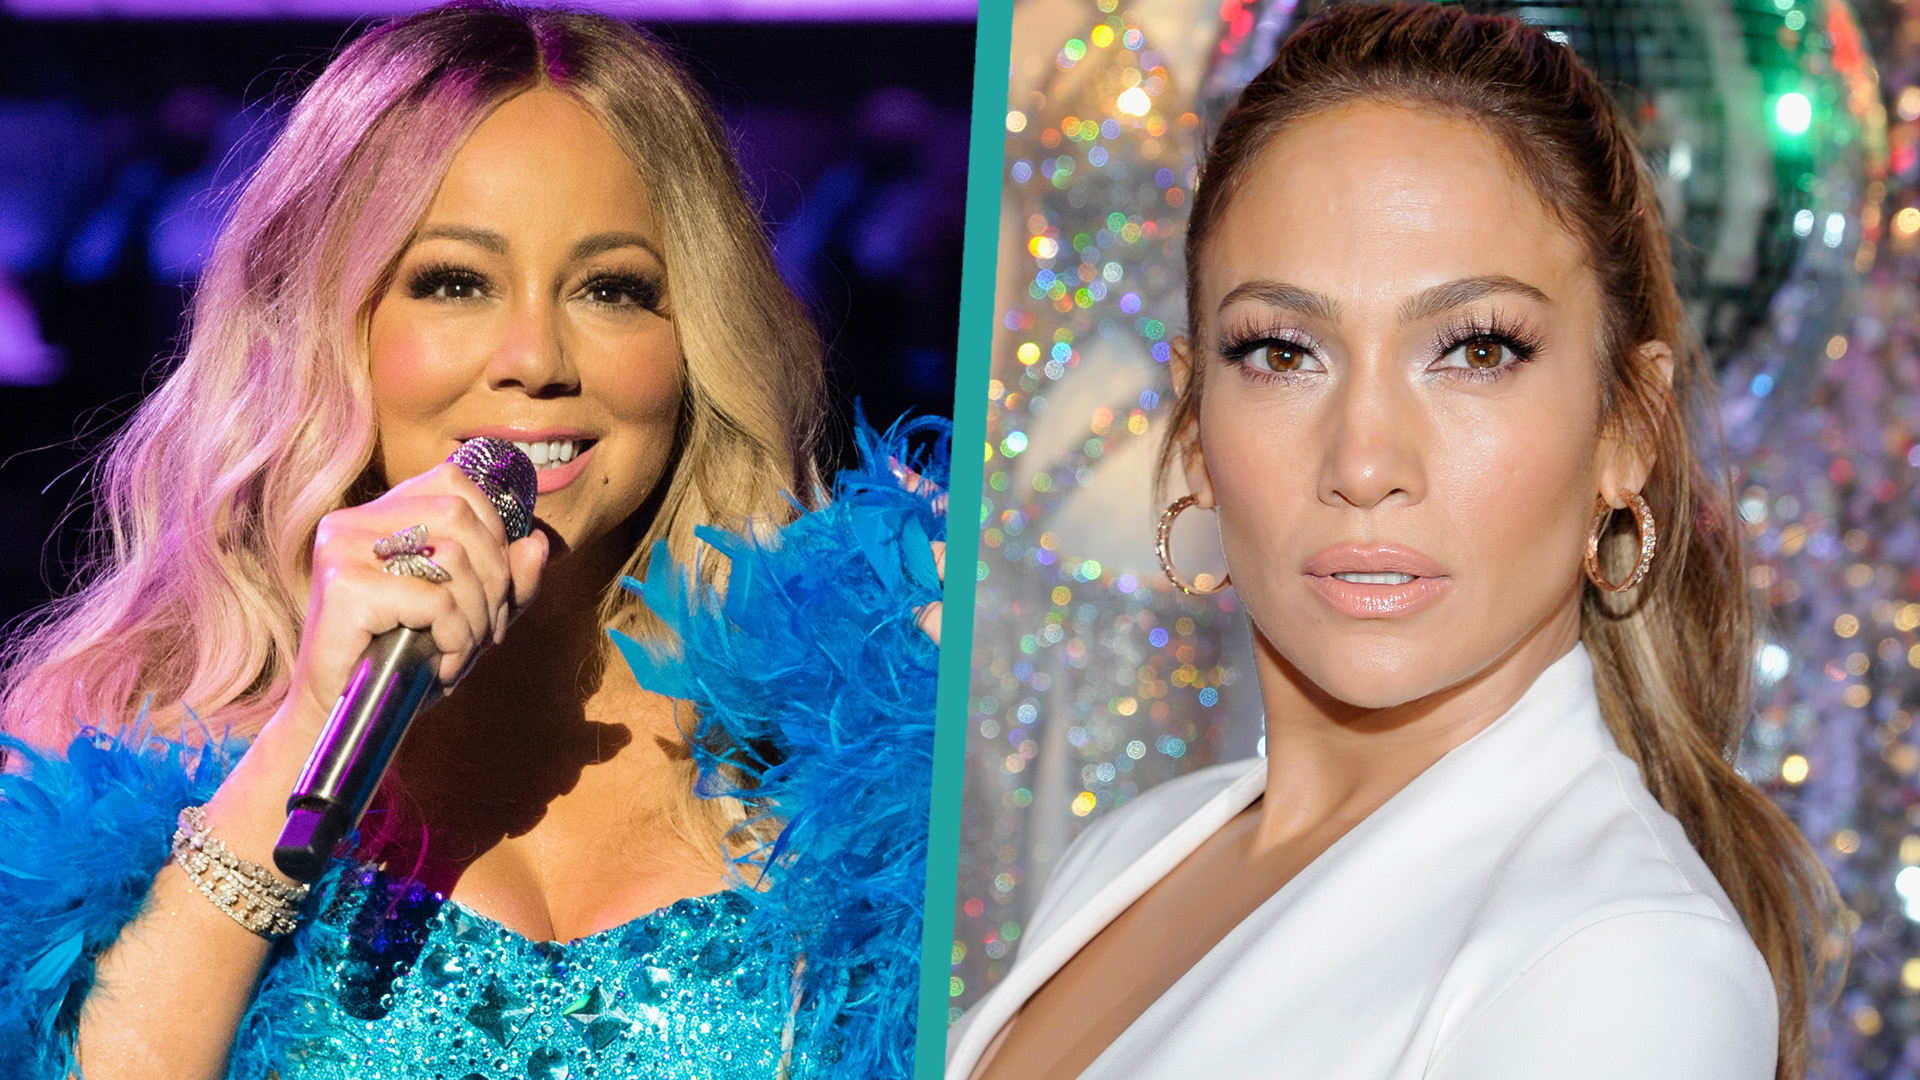 Hollywood Mariah Carey Reveals Real Reason For Jennifer Lopez Feud In New Memoir - Access Hollywood thumbnail